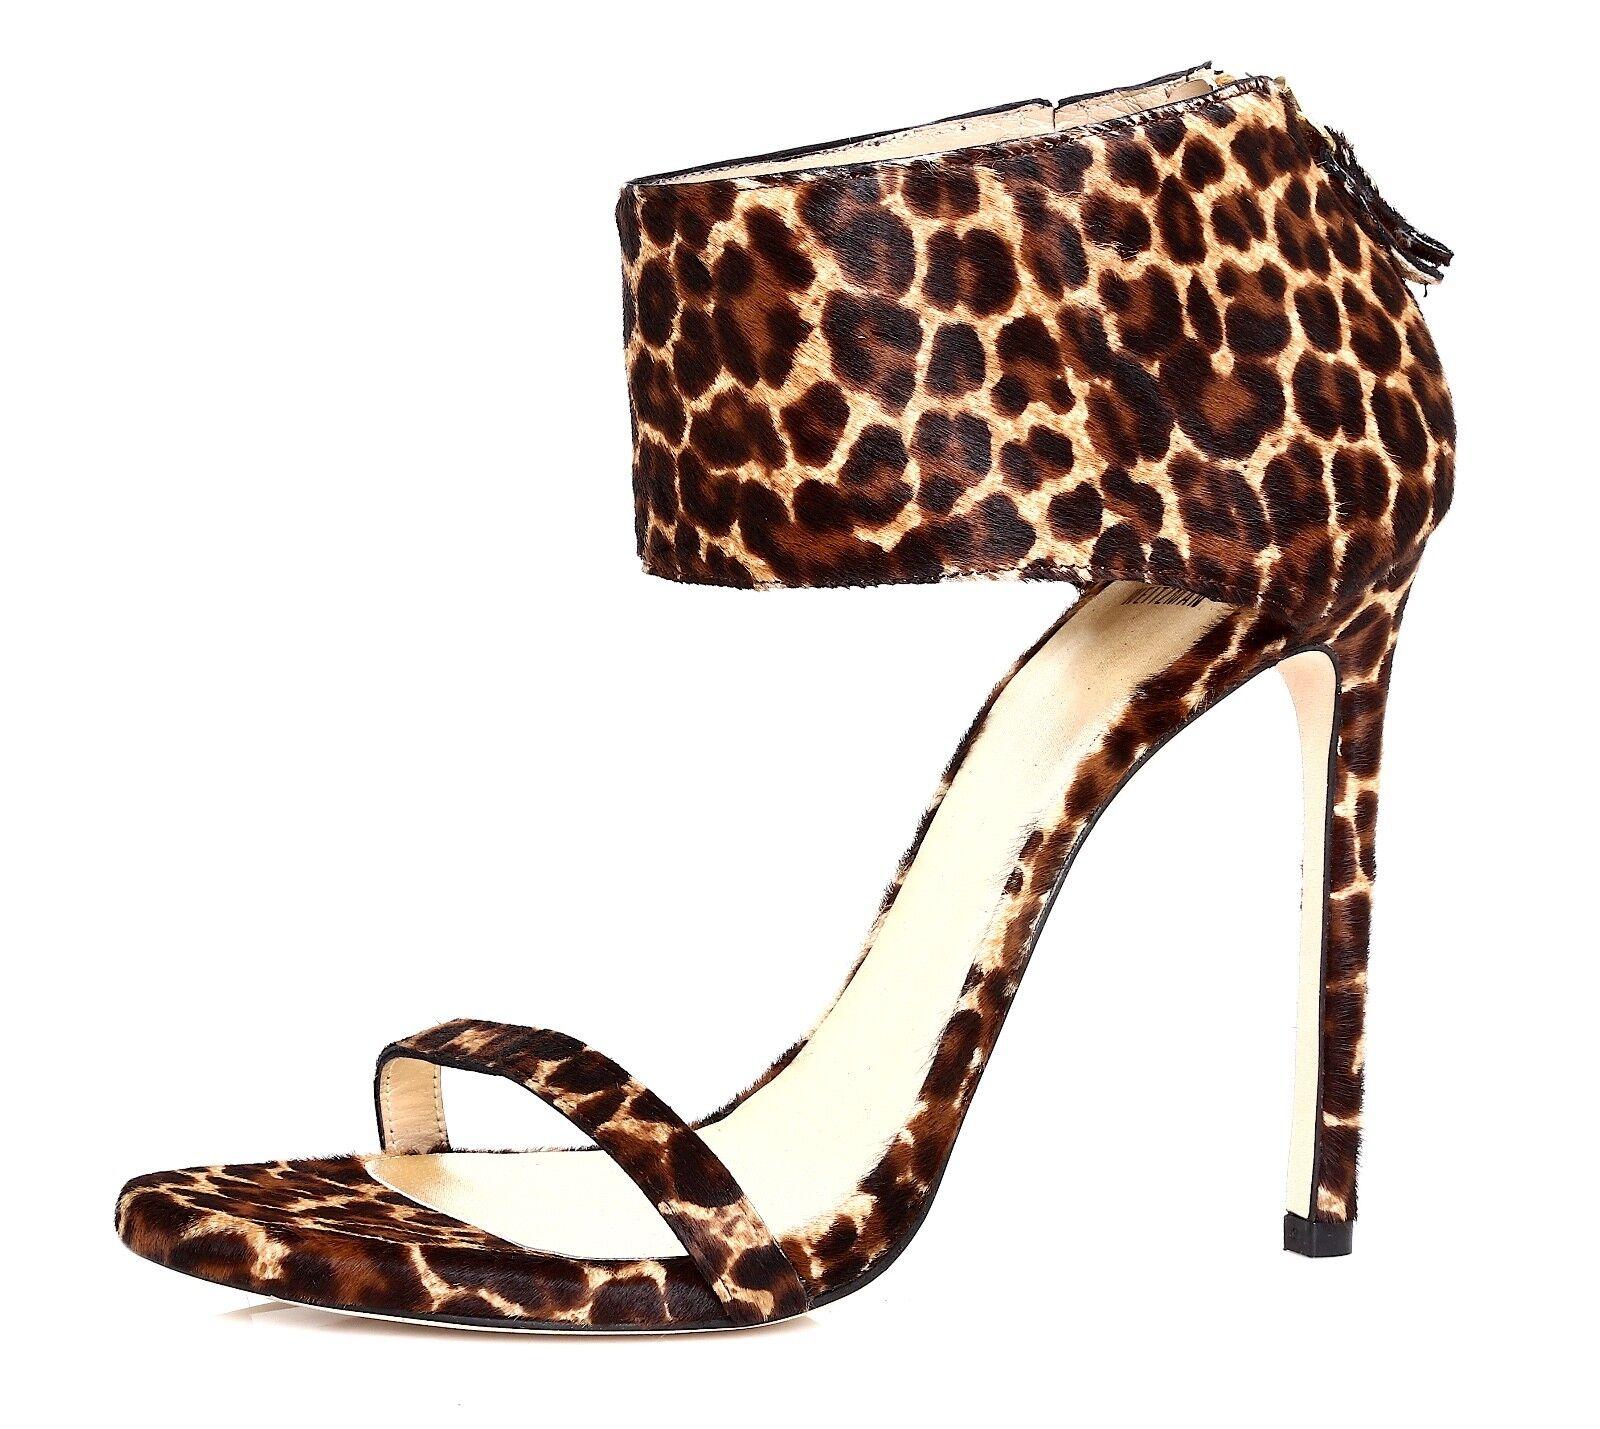 Stuart Weitzman Showgirl Ankle Cuff Sandal Chocolate Calf Hair damen 10.5M 4104